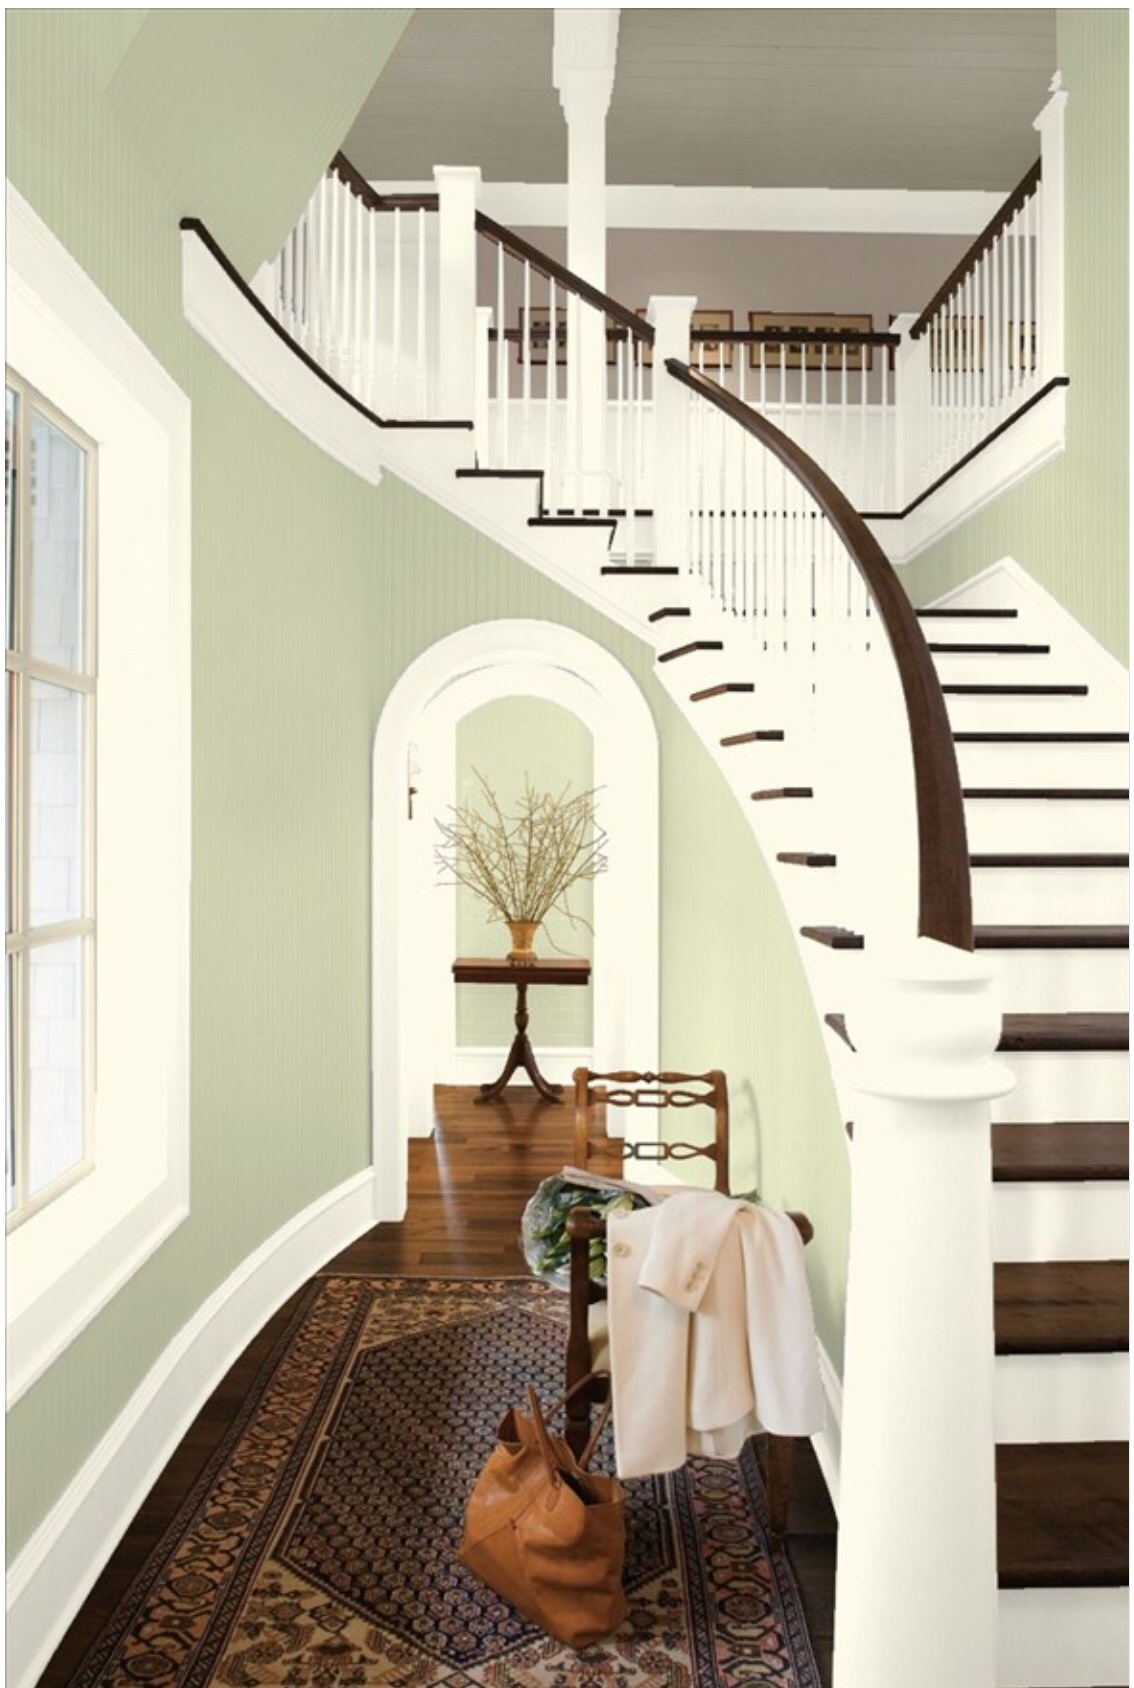 2015 benjamin moore paint color of the year blackhawk hardware. Black Bedroom Furniture Sets. Home Design Ideas